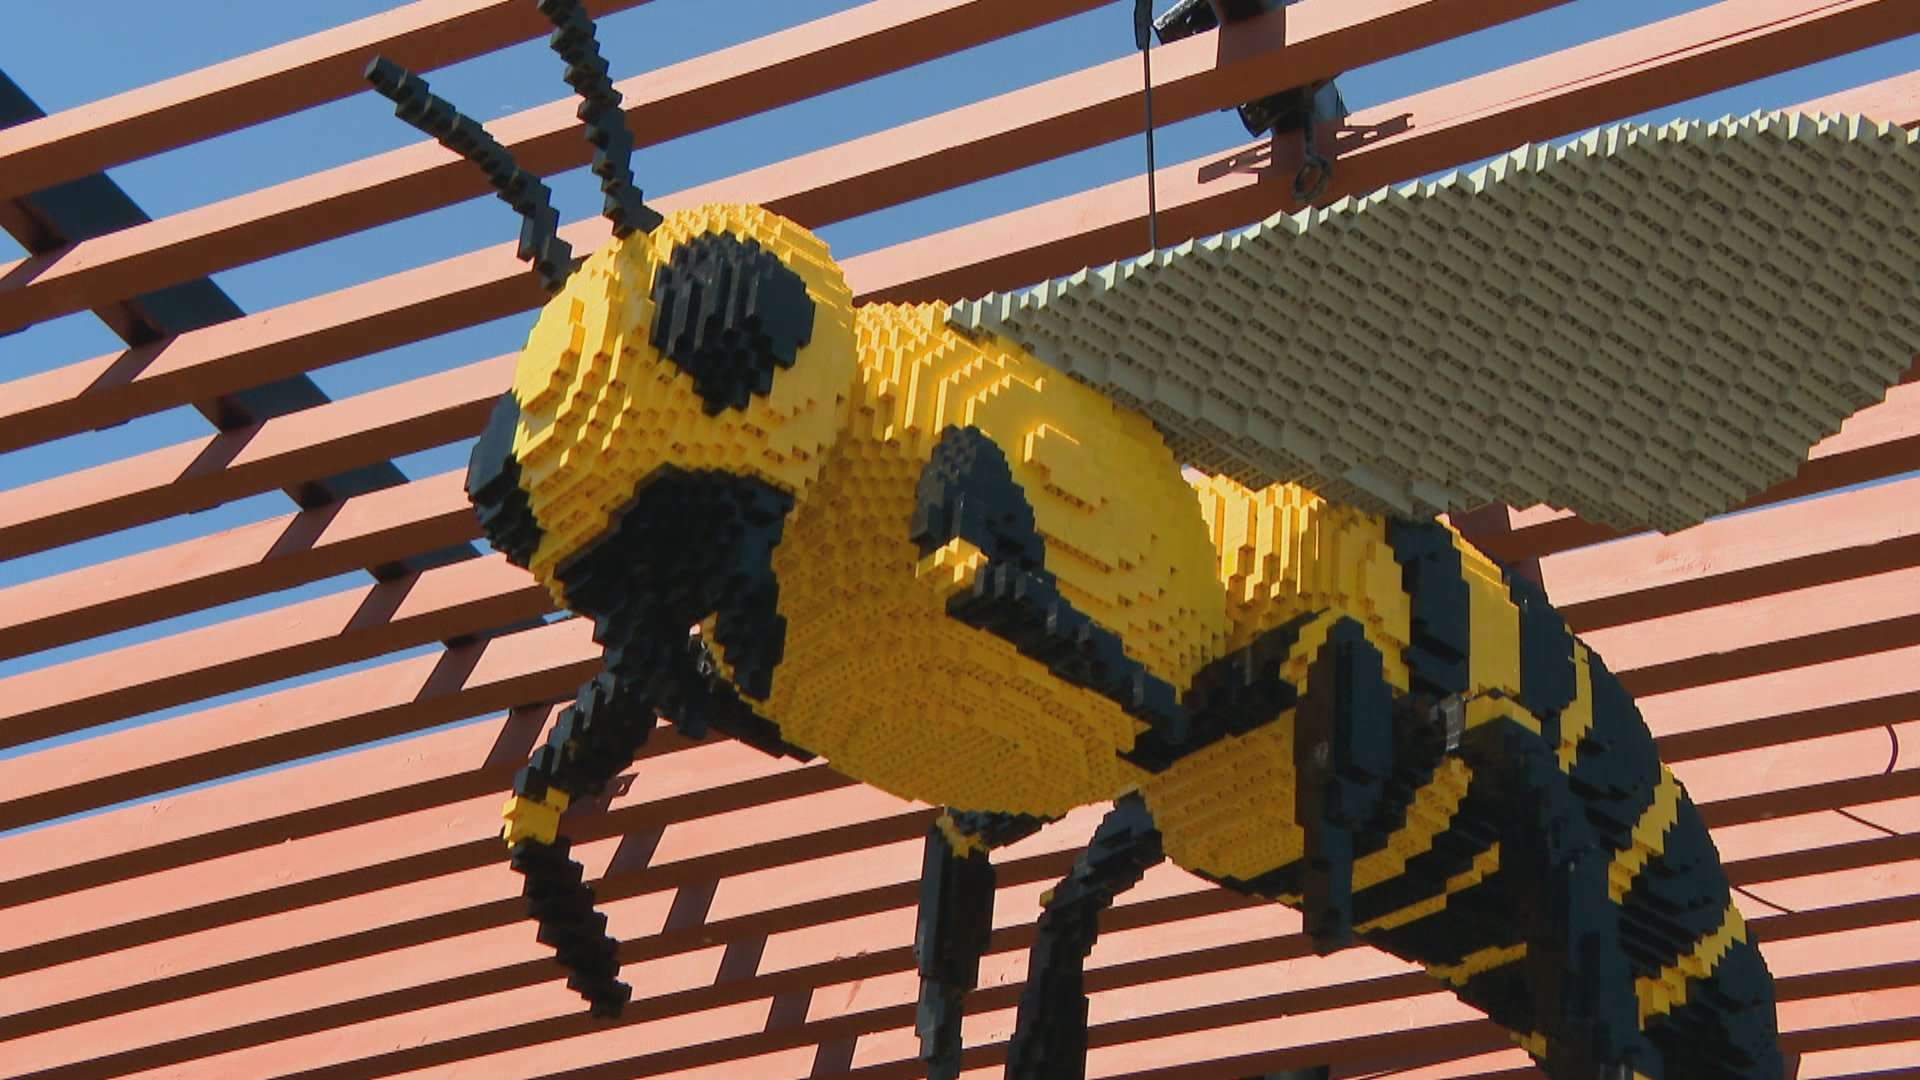 Morton Arboretum Builds Connections to Nature, Brick by Lego Brick